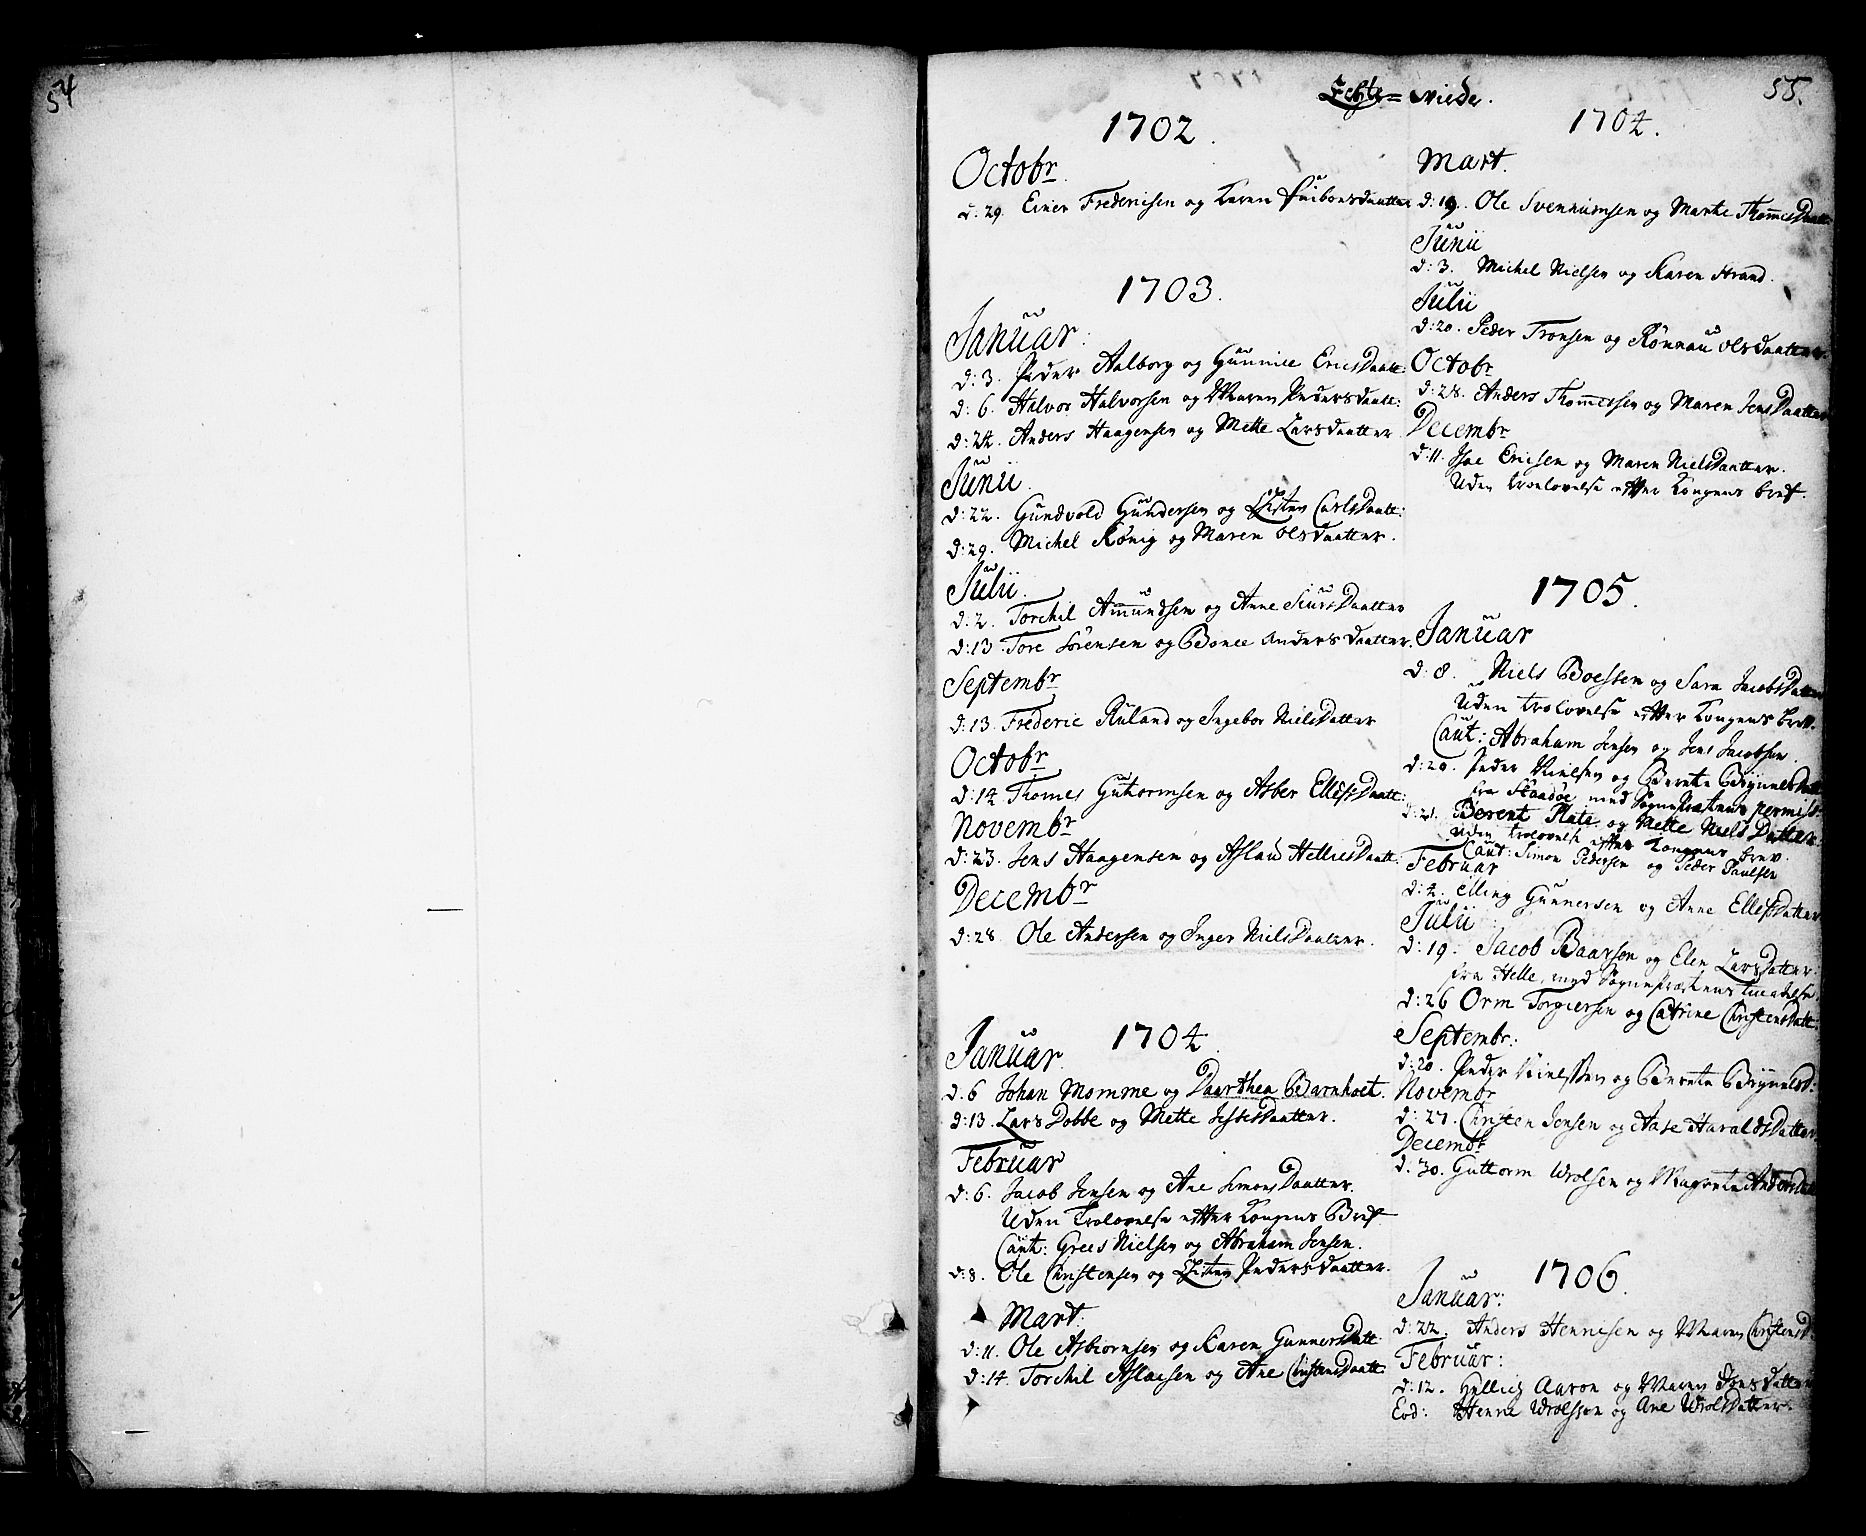 SAKO, Kragerø kirkebøker, F/Fa/L0001: Ministerialbok nr. 1, 1702-1766, s. 54-55